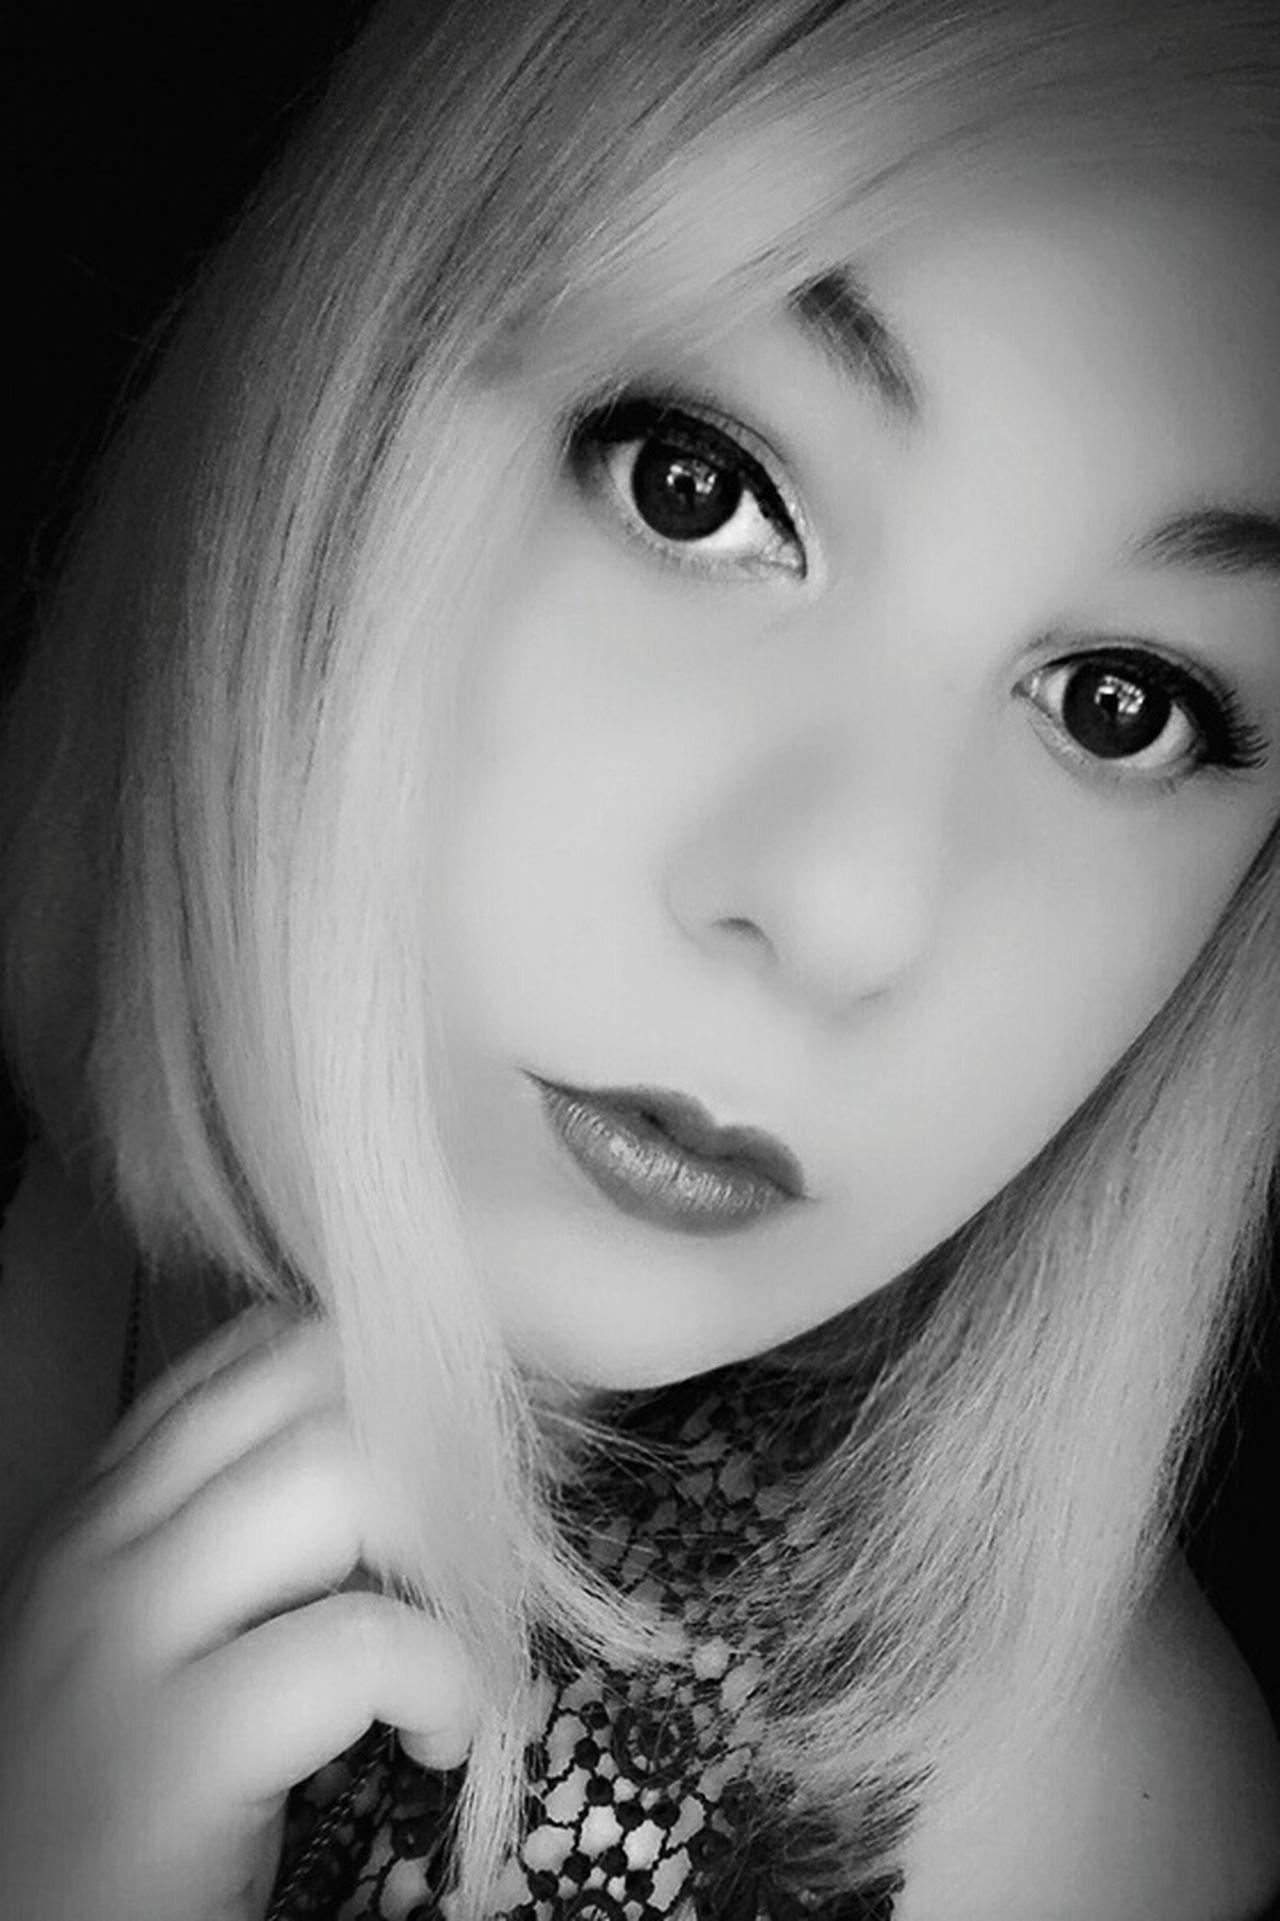 Me ThatsMe Portrait Portraits Selfie ✌ Selfies Self Portrait Selfie Portrait Bnw Blackandwhite Inkwell Eye Like4like Girl Woman Alternativegirl Metalhead Nofilter One Person Blonde People Eyes Makeup Lips Lipstick